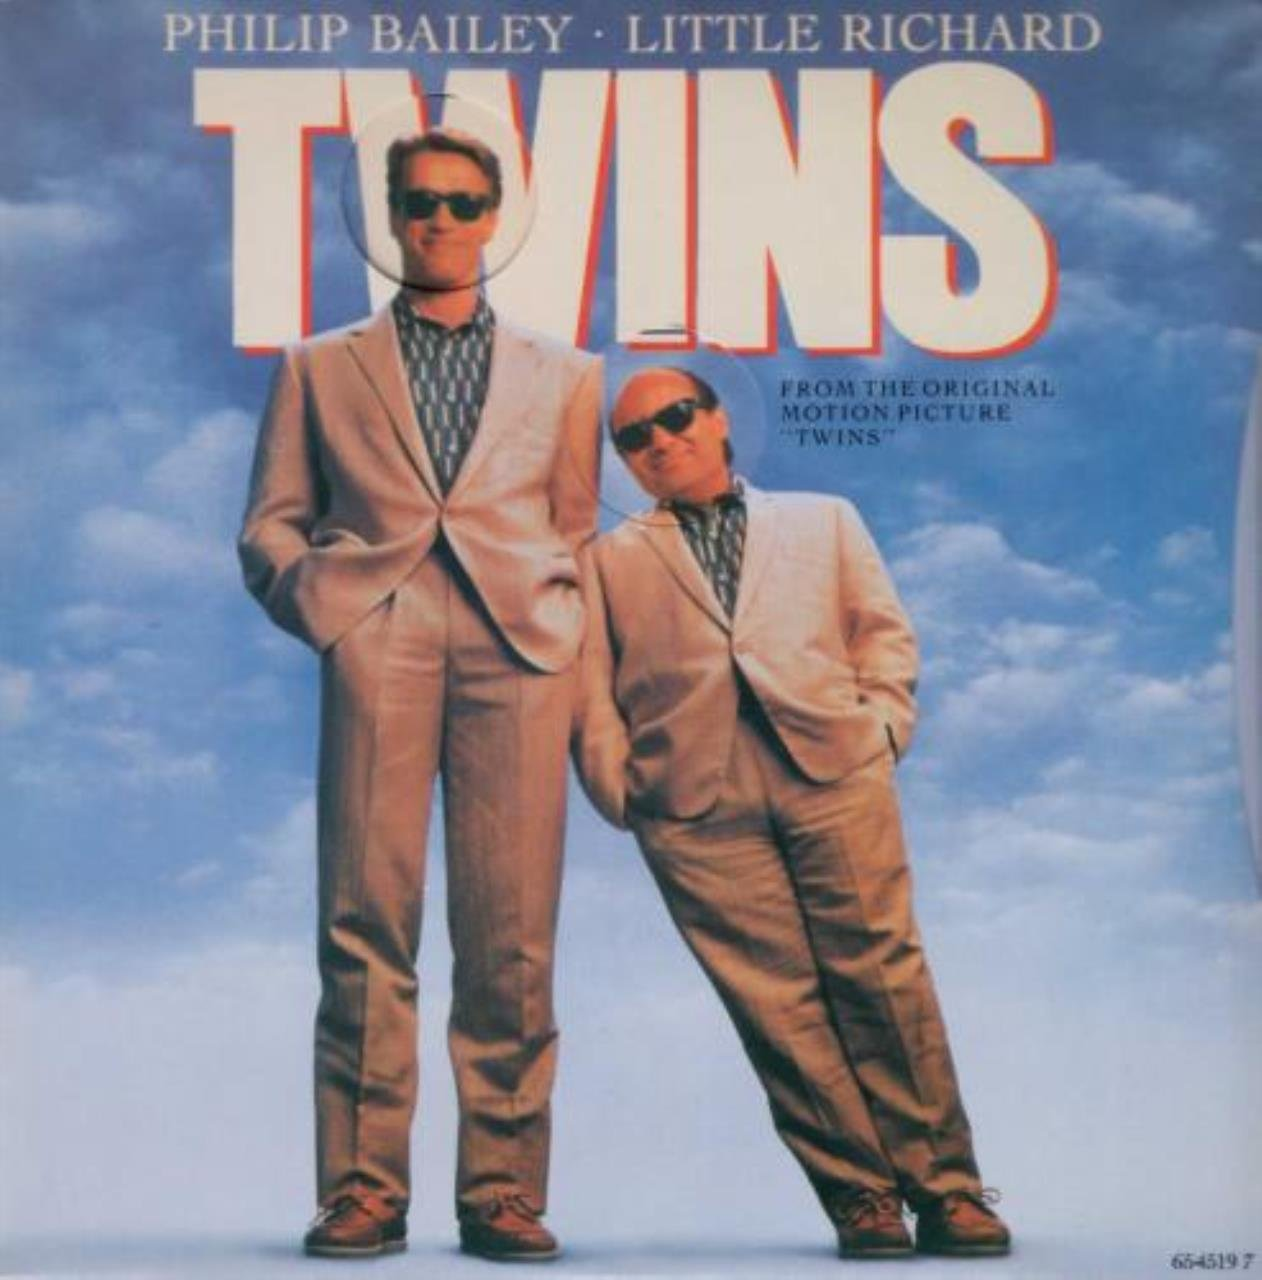 Philip Bailey Twins 1988 Little Richard Vinyl Single Vinyl Single 7 Amazon Com Music